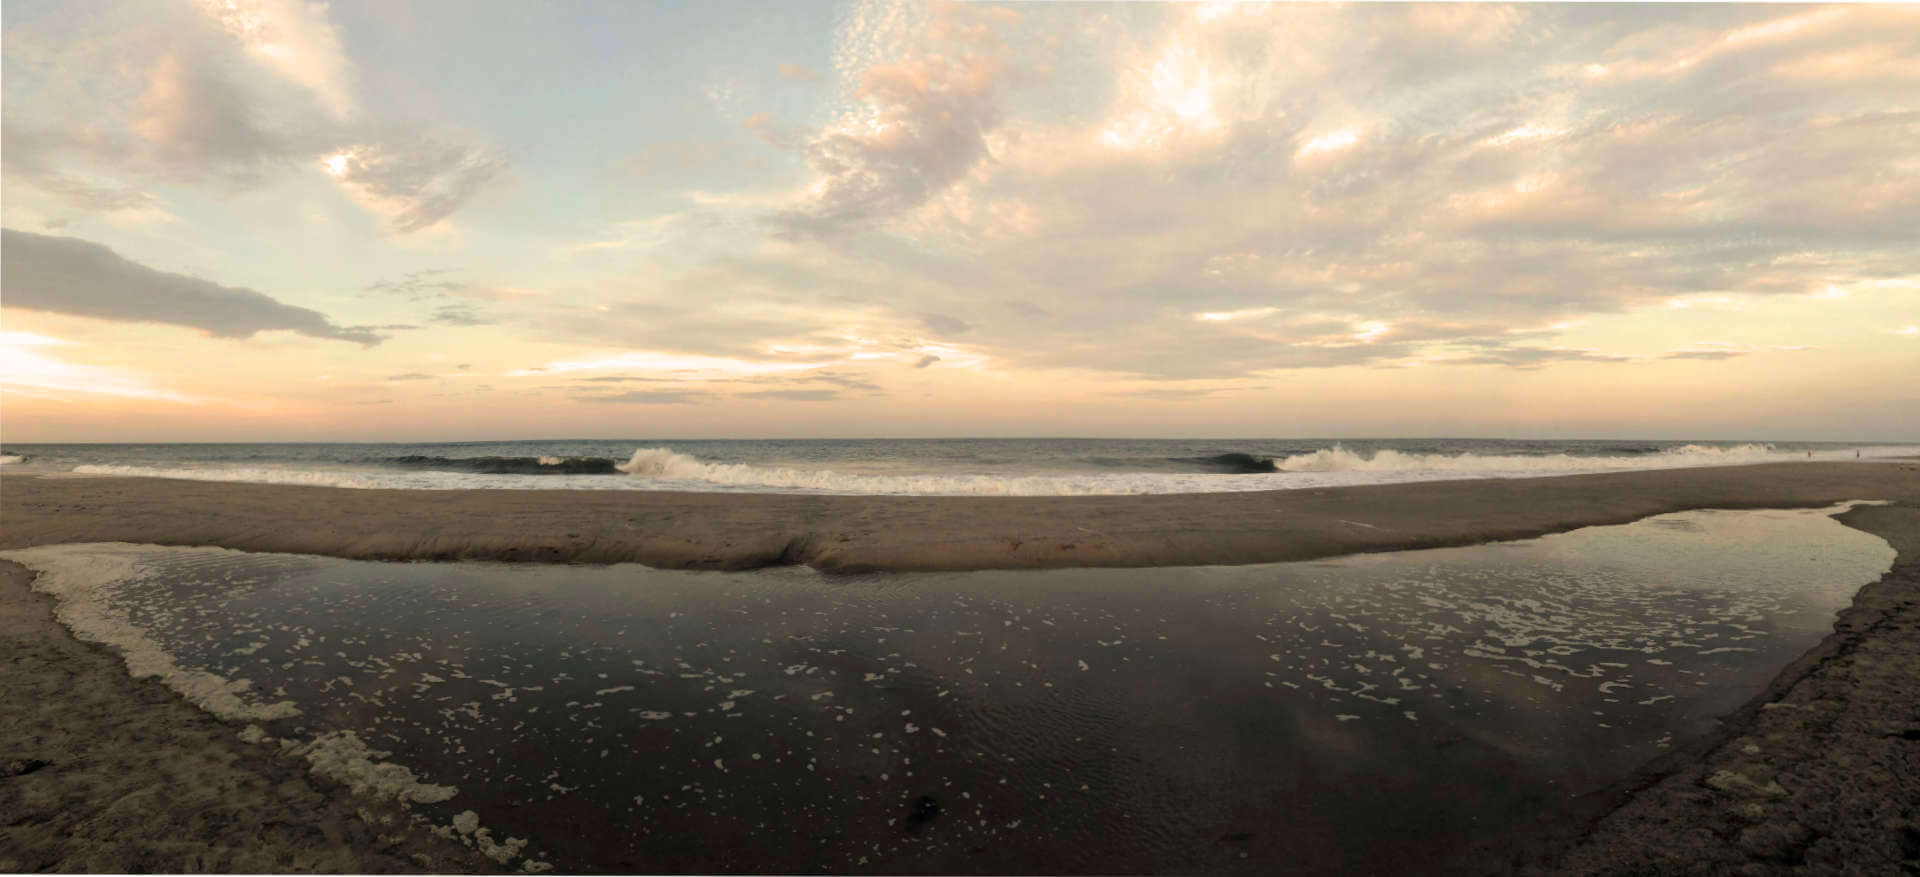 NC's beaches